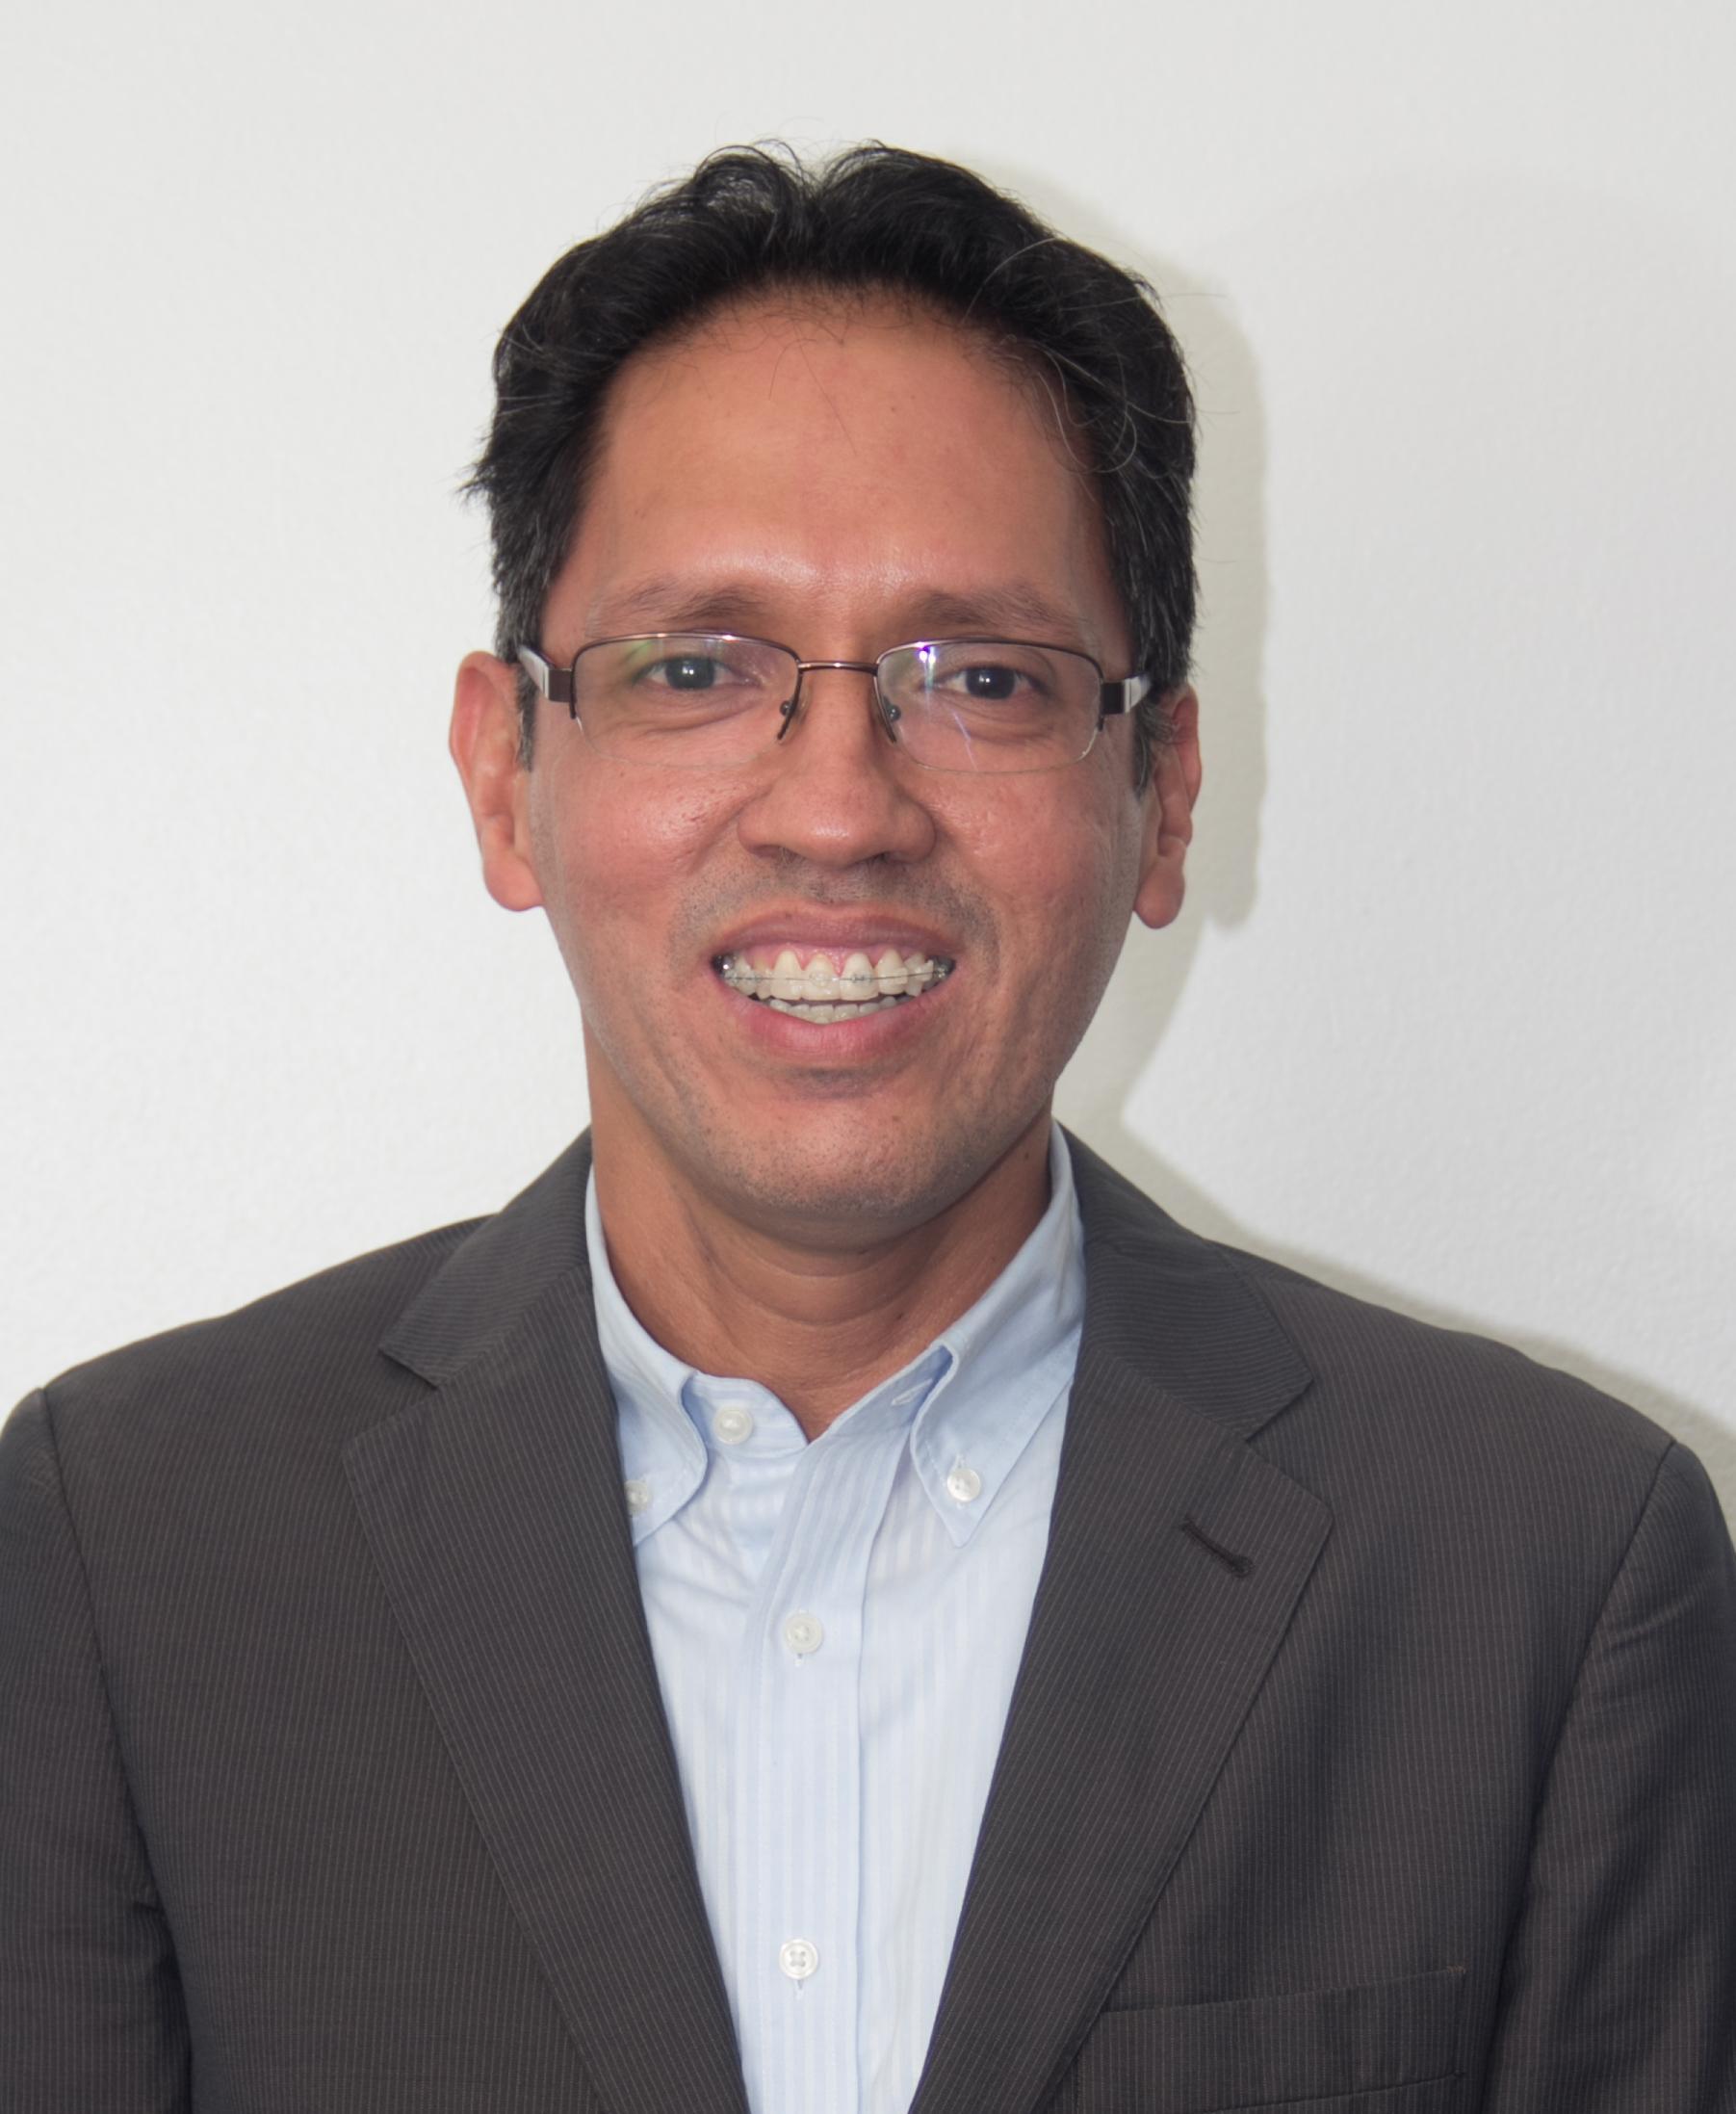 Dr. Roberto Gracias